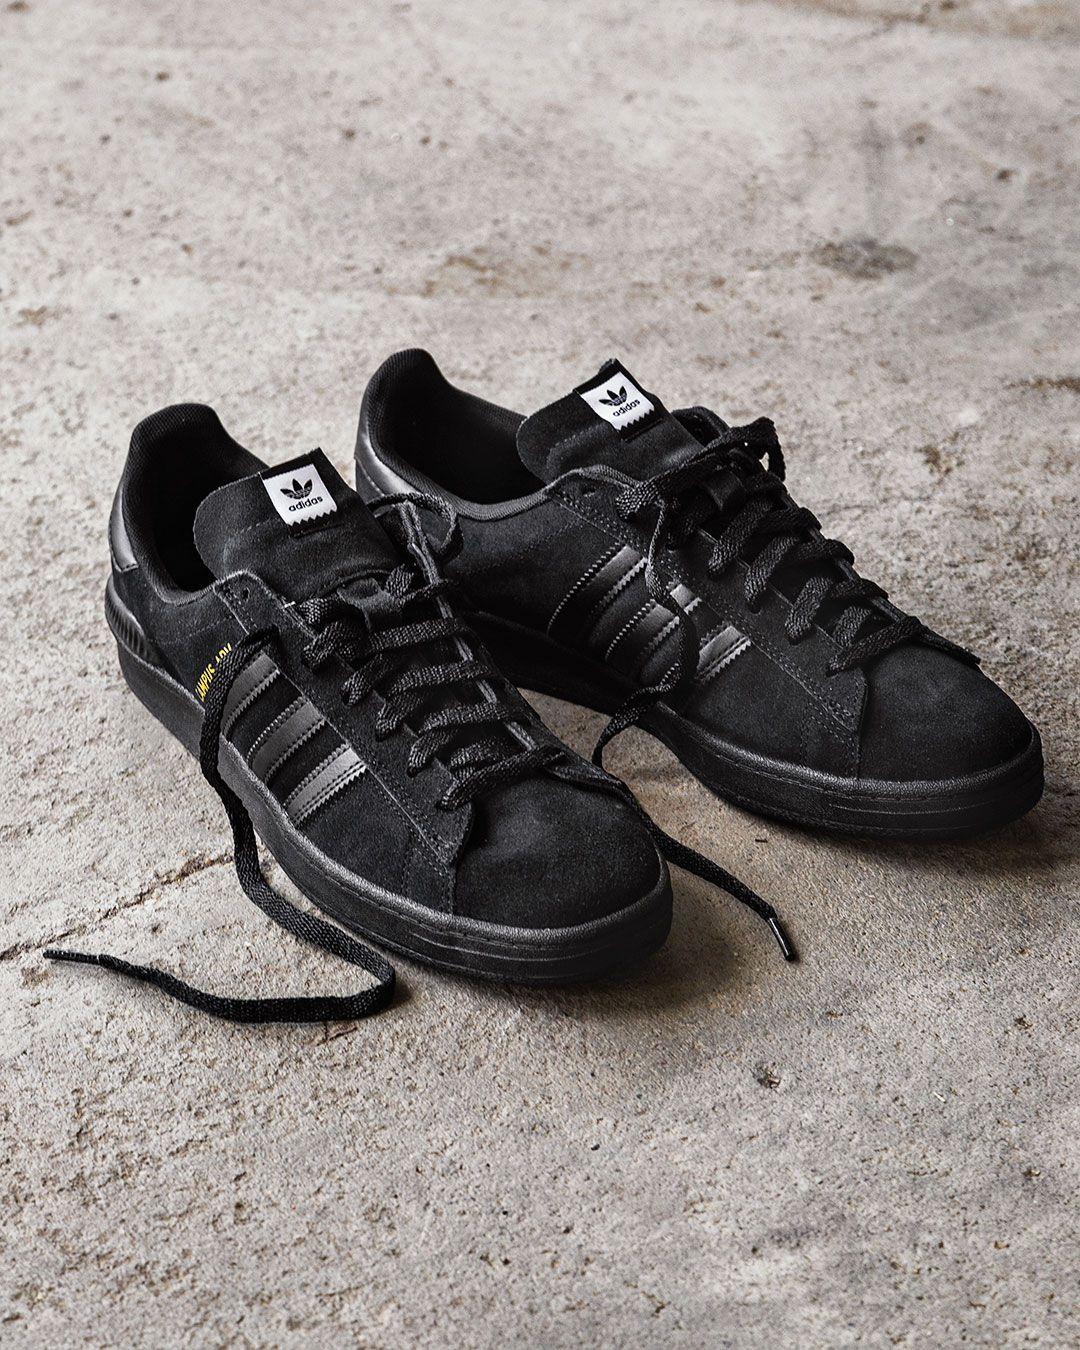 adidas Skateboarding Campus ADV Shoes (core black core black